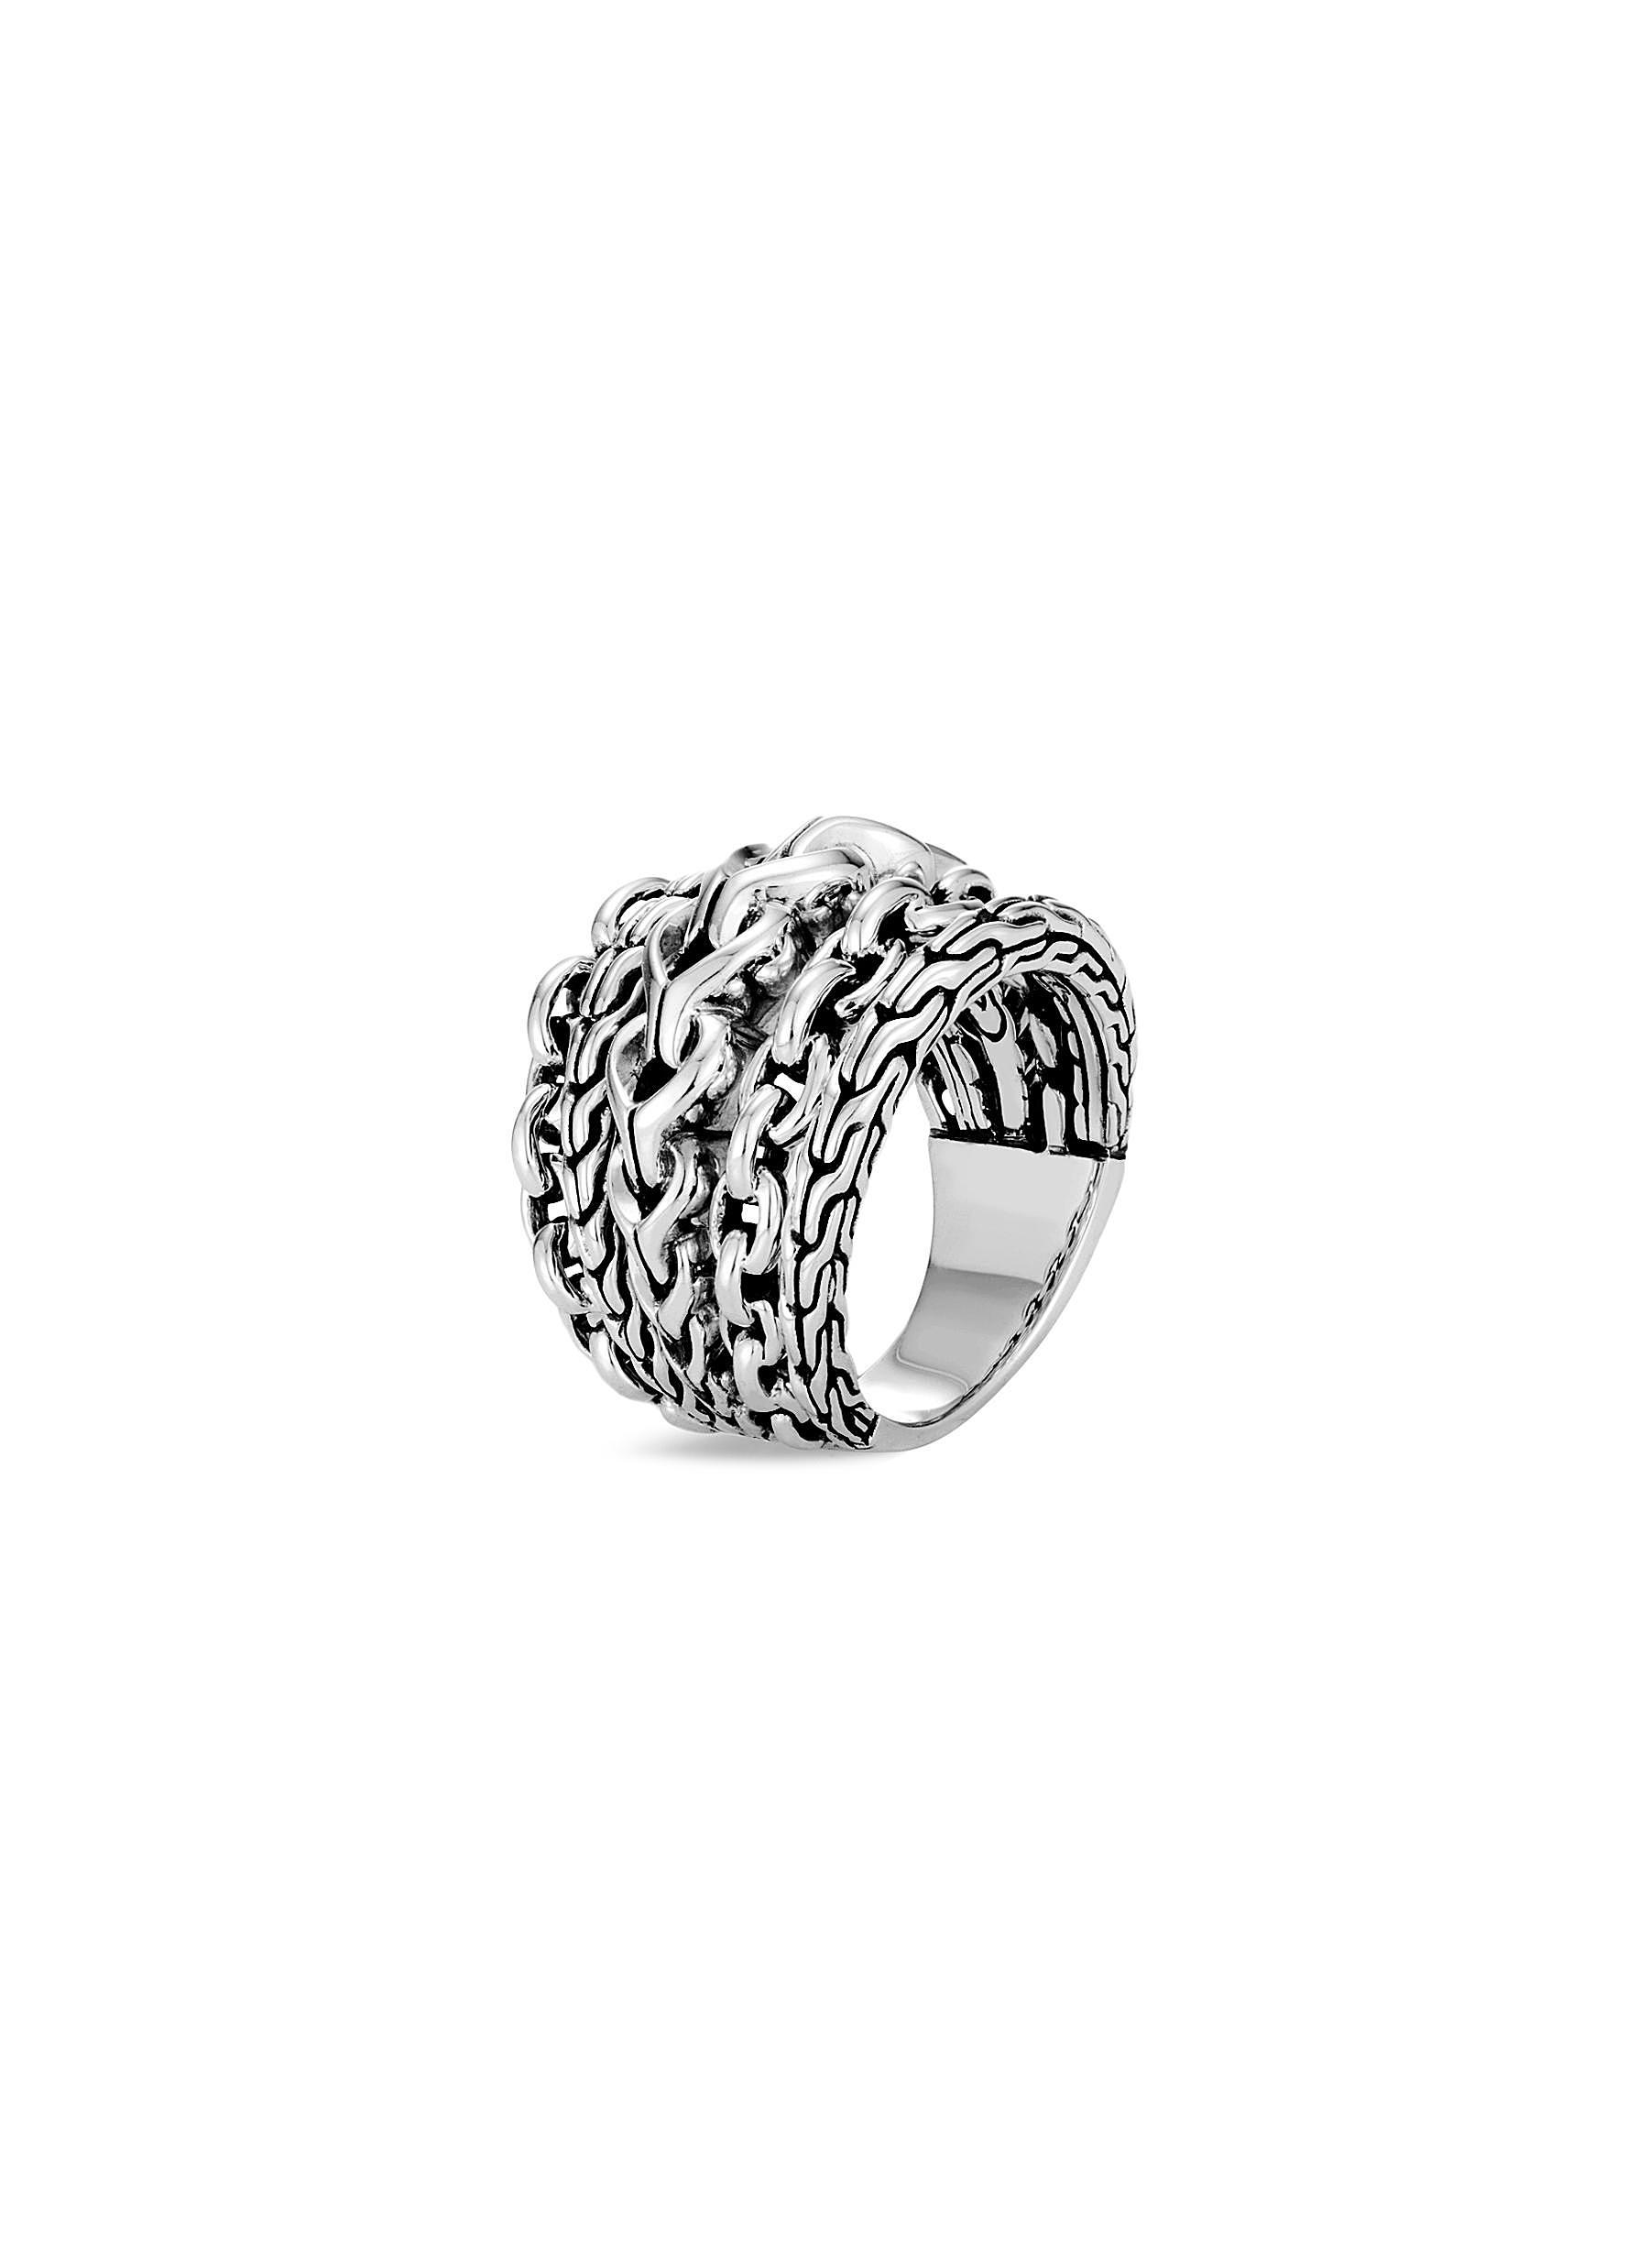 John Hardy Women's Classic Chain Sterling Silver Ring